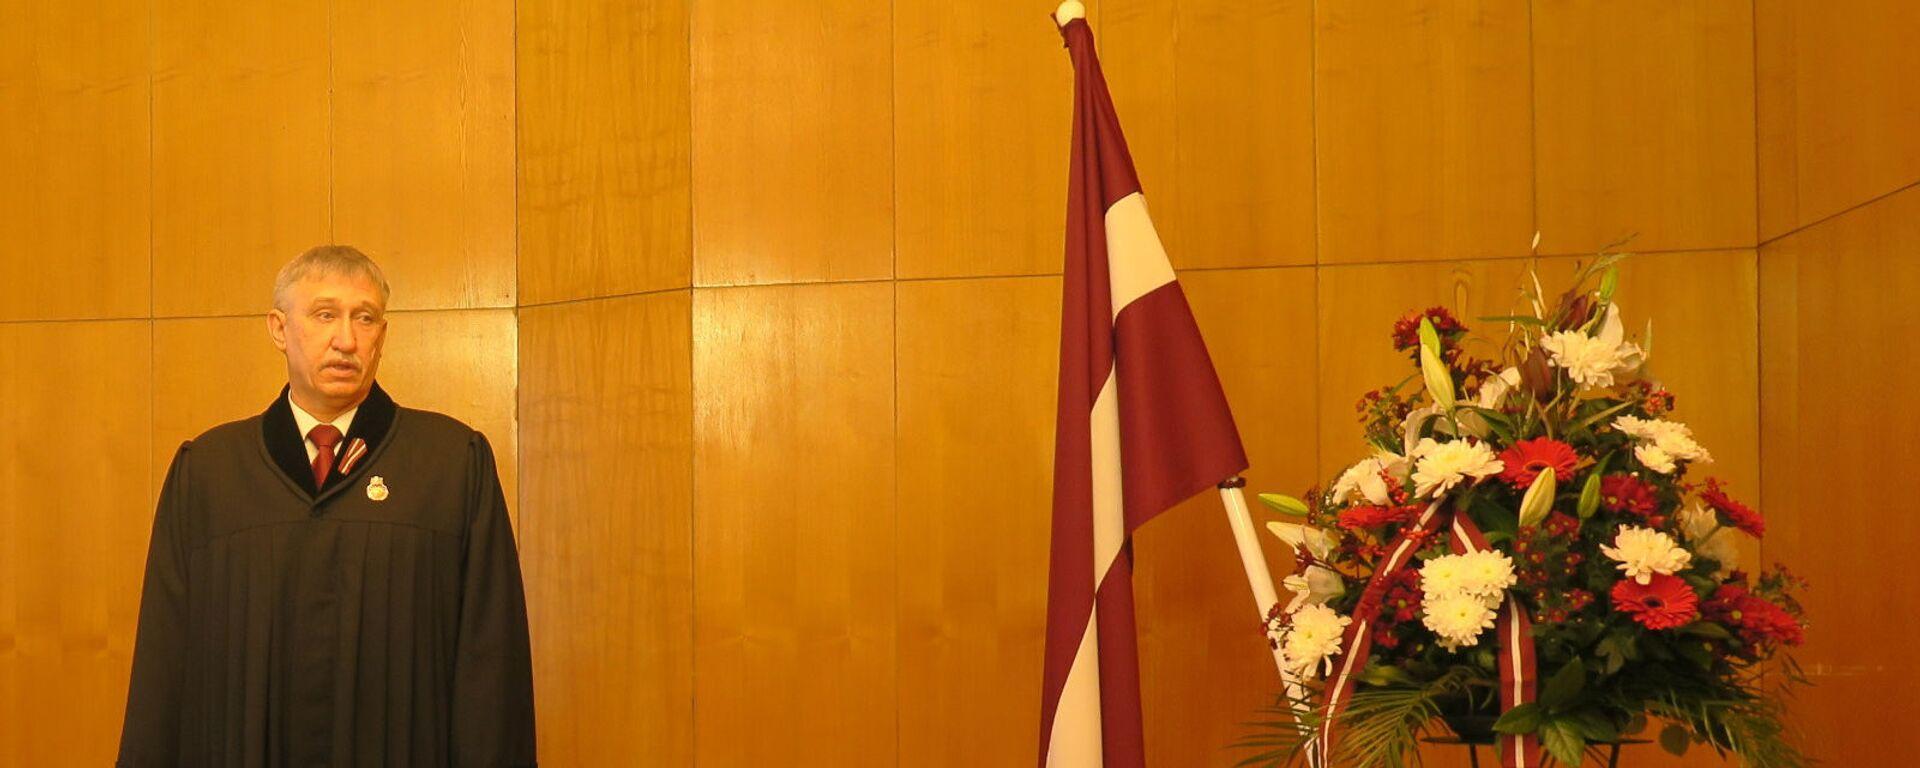 Генпрокурор Латвии Эрикс Калнмейерс - Sputnik Латвия, 1920, 11.01.2019